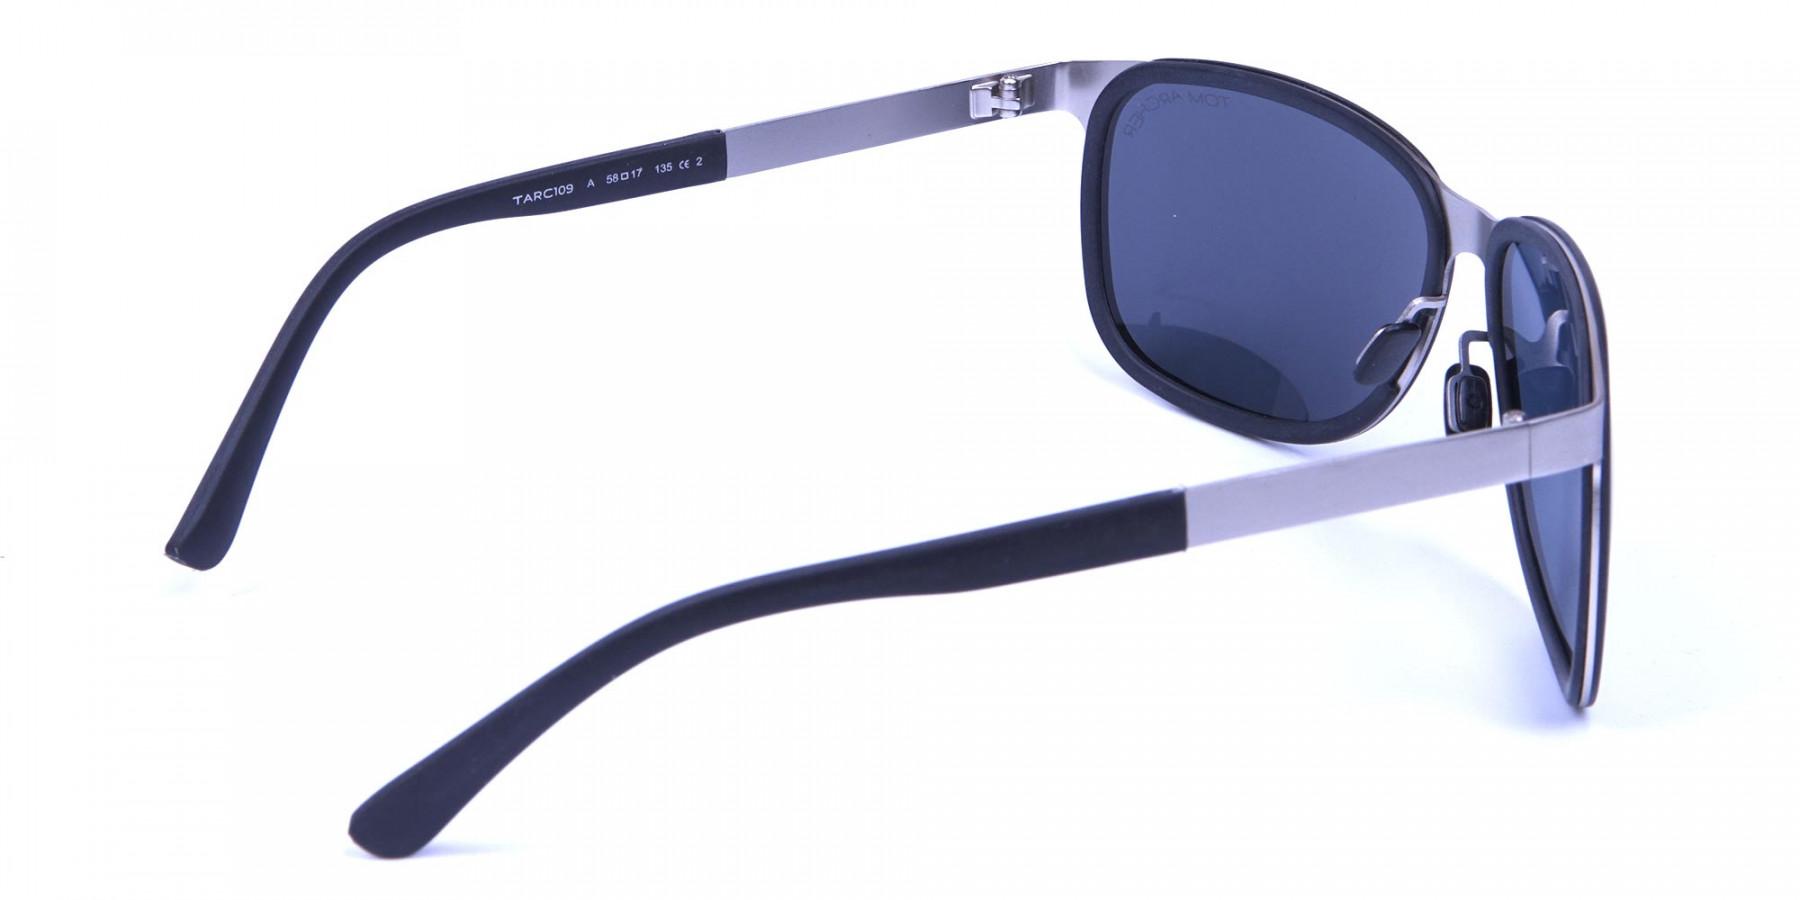 Flattering Silver Sunglasses -2